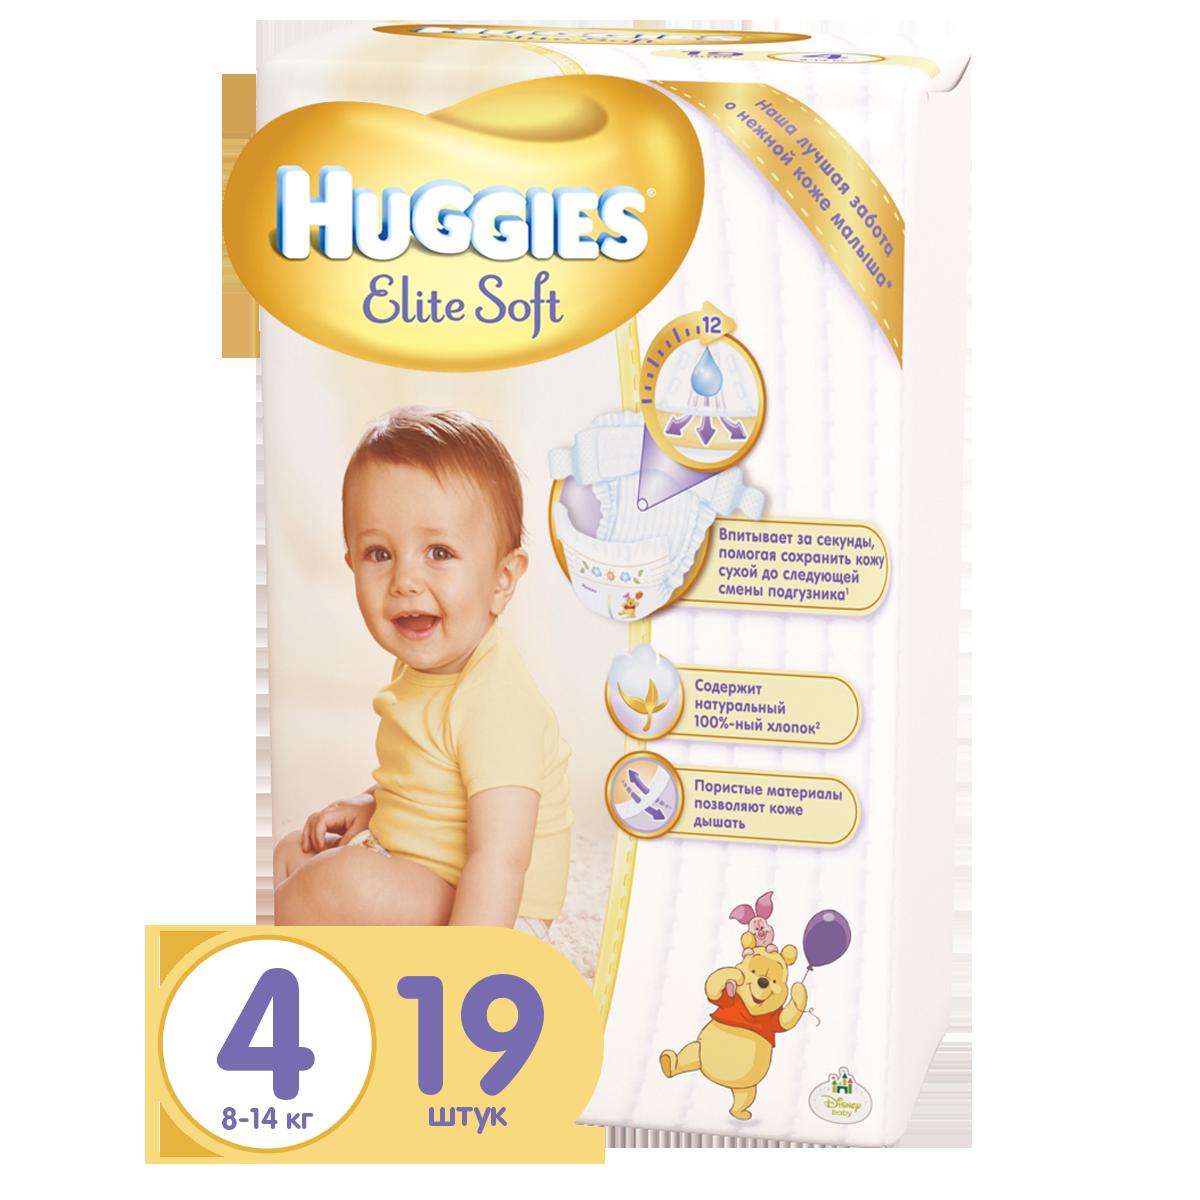 Подгузники Huggies Elite Soft Conv Pack 8-14 кг (19 шт) Размер 4<br>